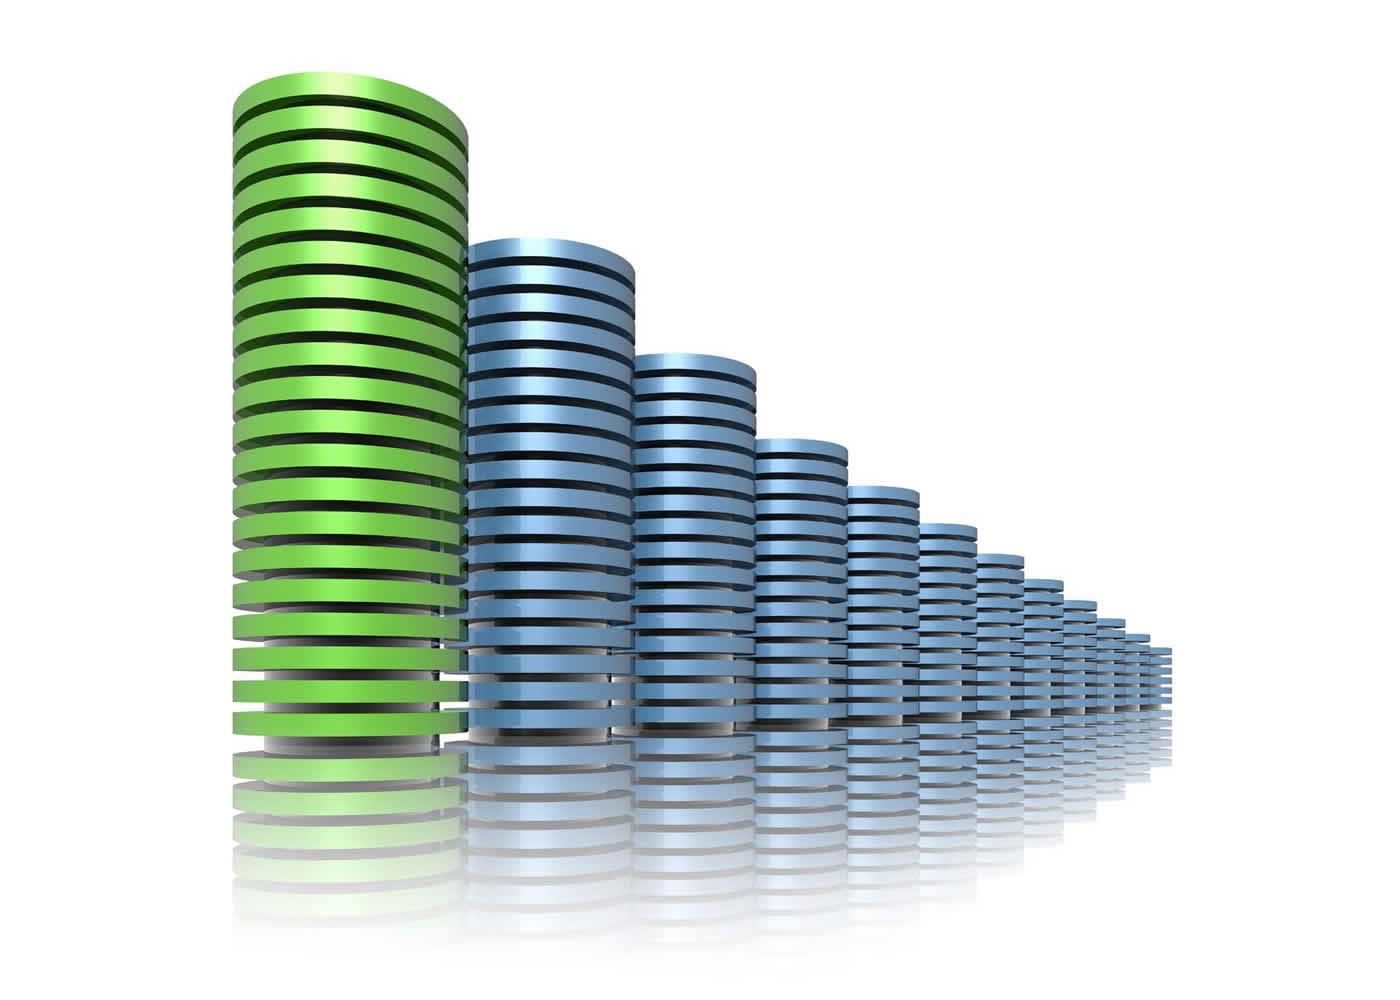 naem-research-reports-2012-green-metrics-that-matter-leading-edge-metrics-and-programs-1560x2010